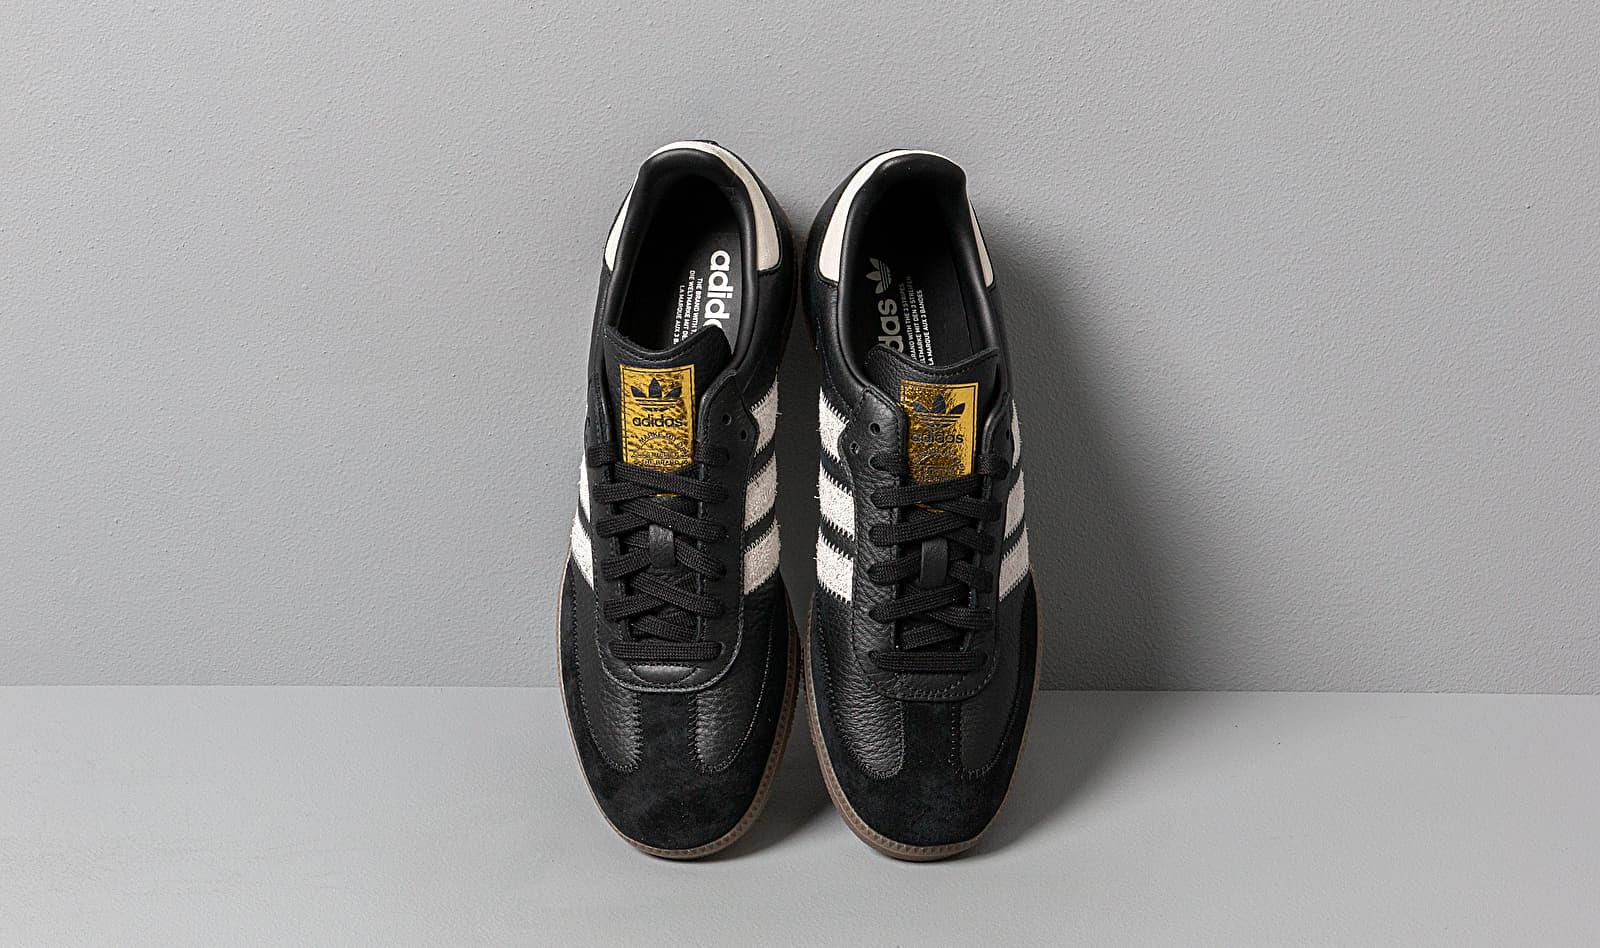 Indulgente Antorchas Forma del barco  adidas Originals Adidas Samba Og Ft Core Black/ Raw White/ Gold Metalic for  Men - Lyst